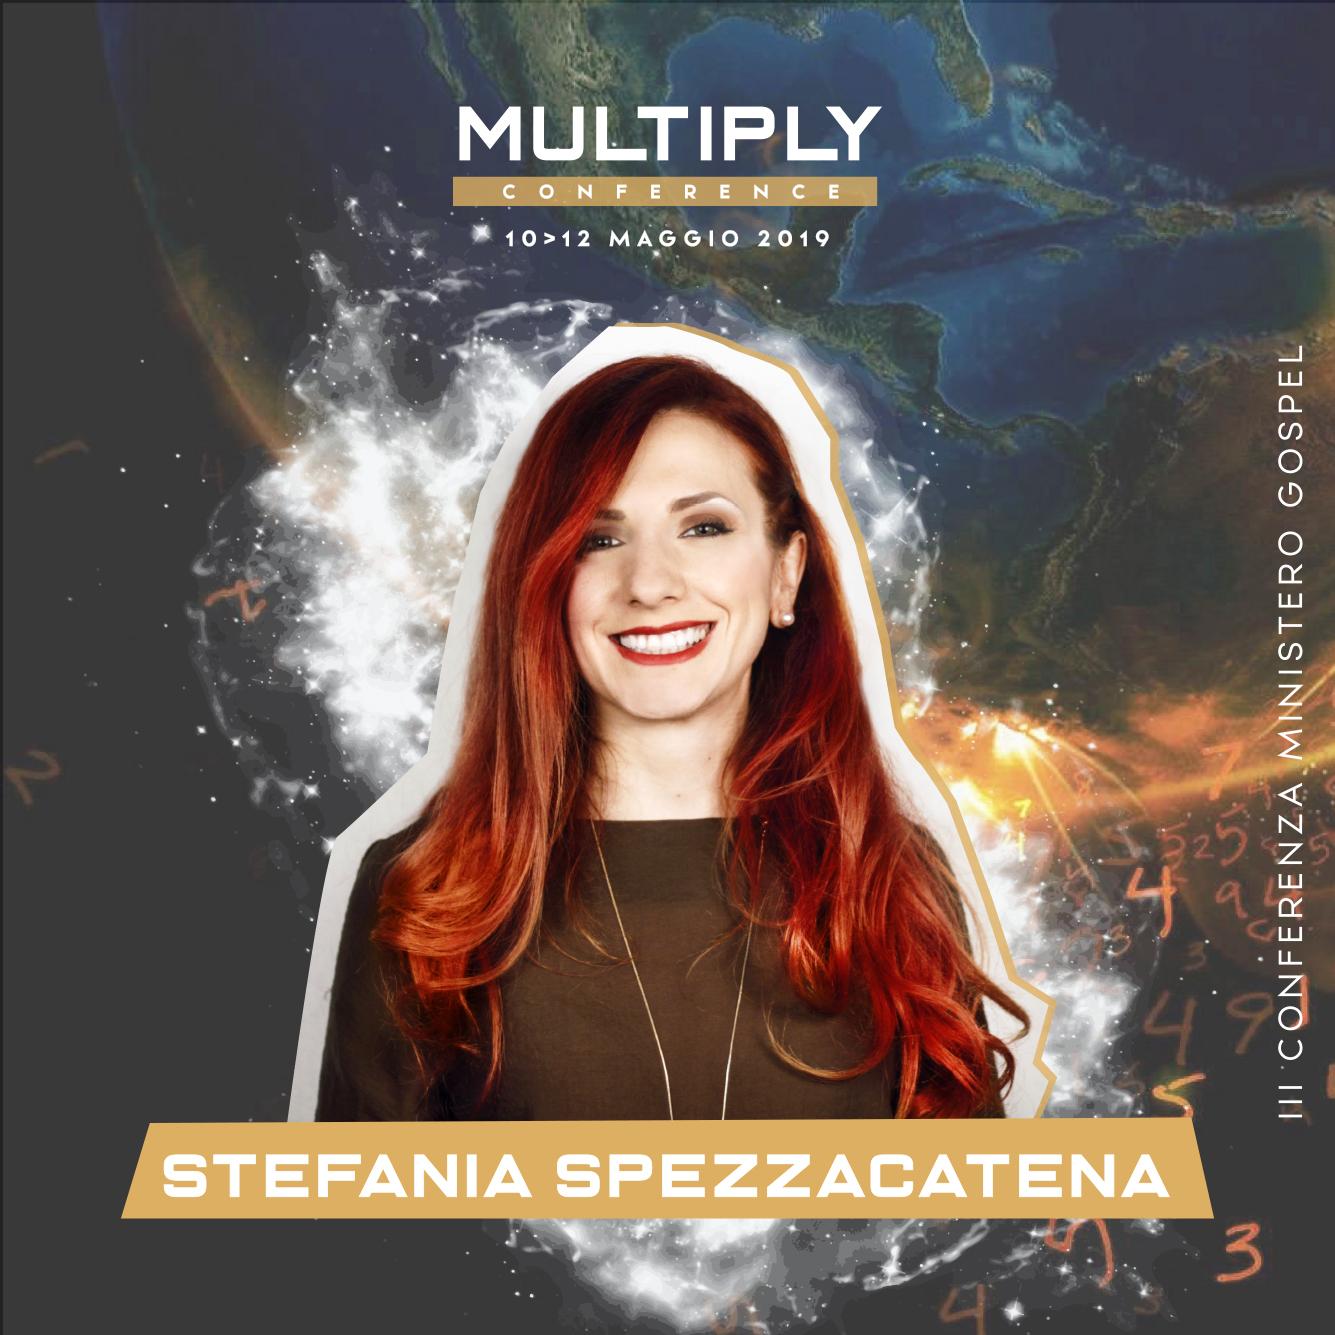 Stefania Spezzacatena